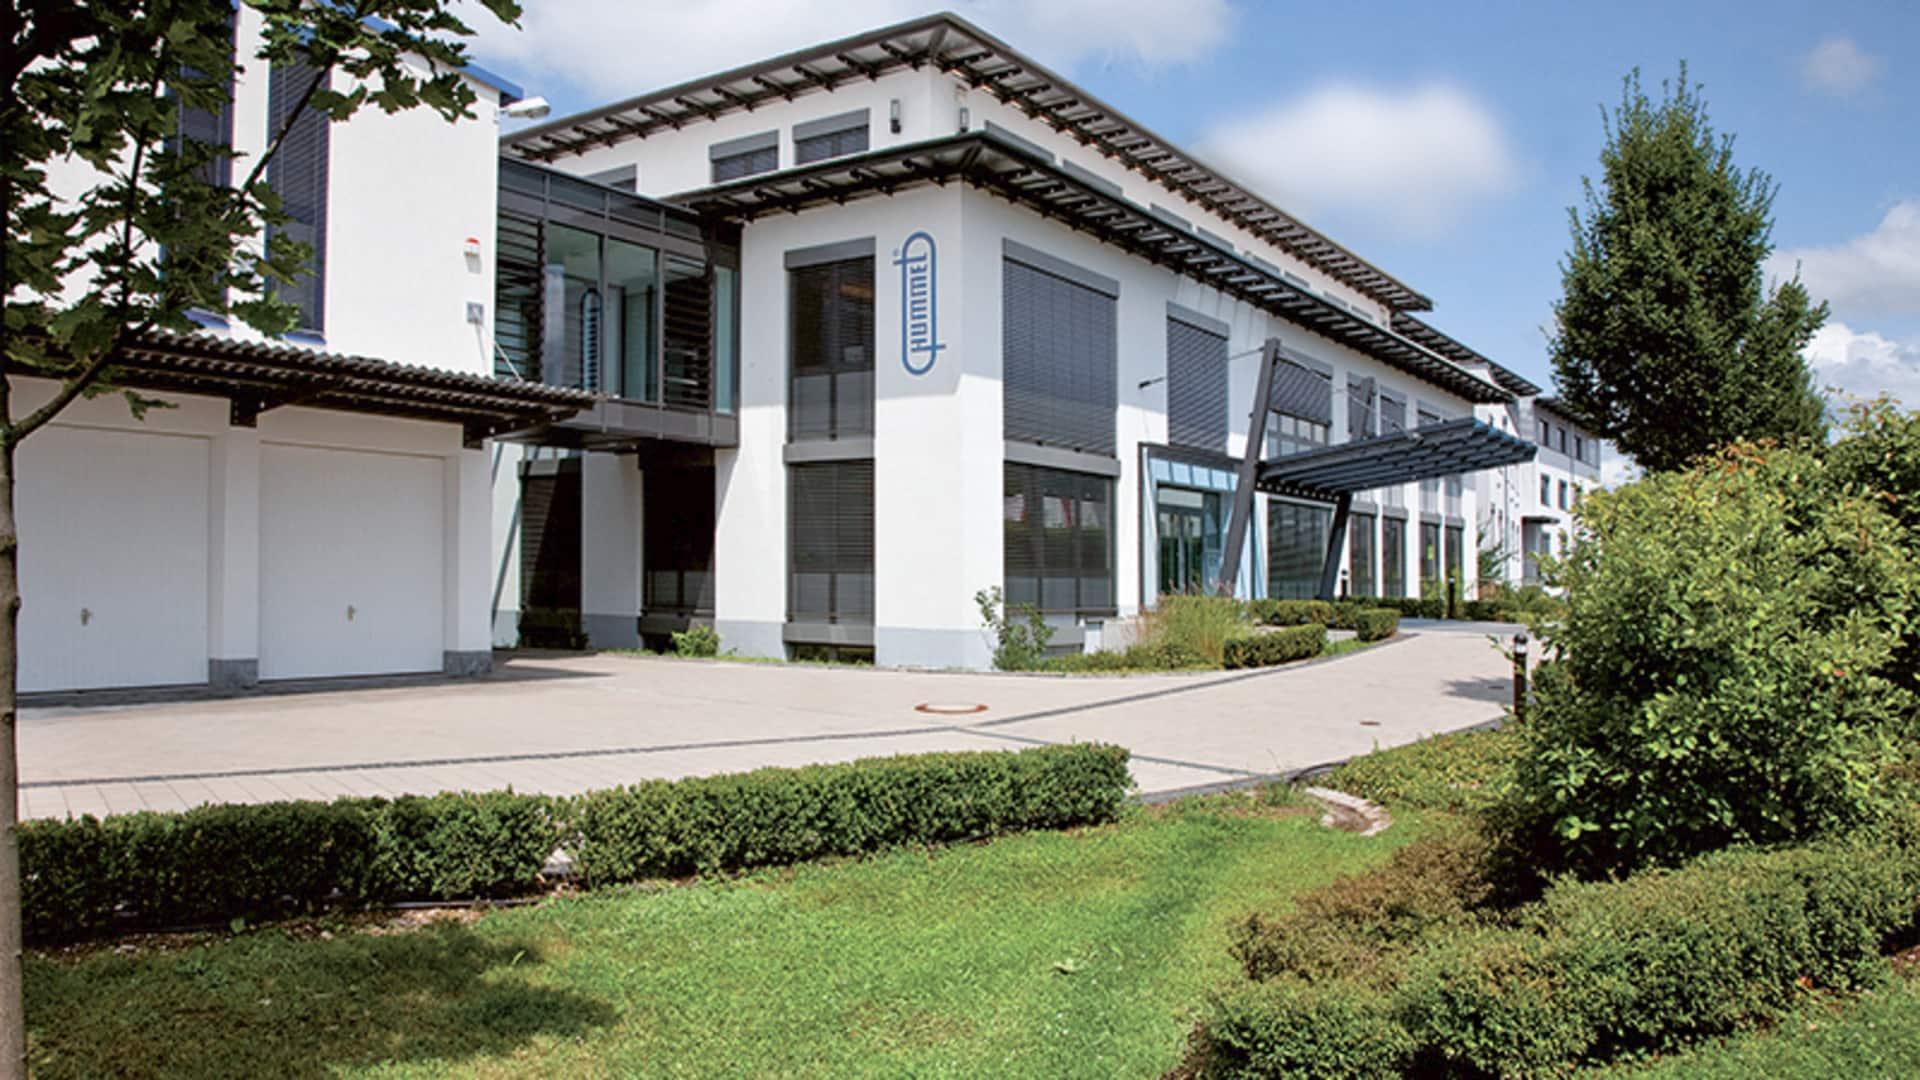 Firmengebäude der Hummel AG in Denzlingen